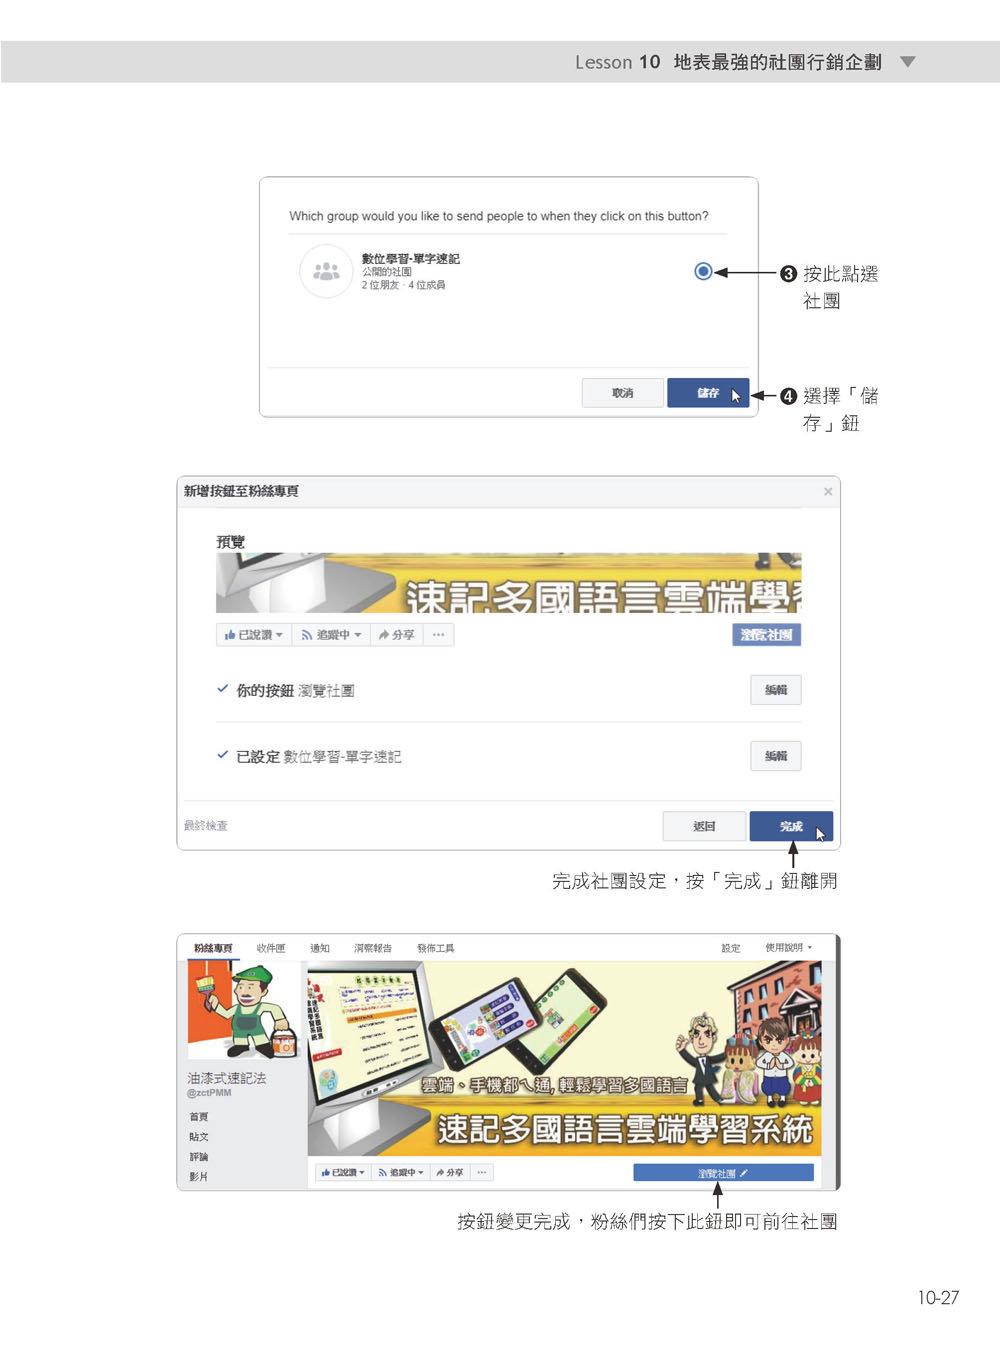 Facebook 互動行銷:社群口碑經營新思路+廣告投放如何有成效,想做好臉書行銷,操作心法就在這!-preview-31